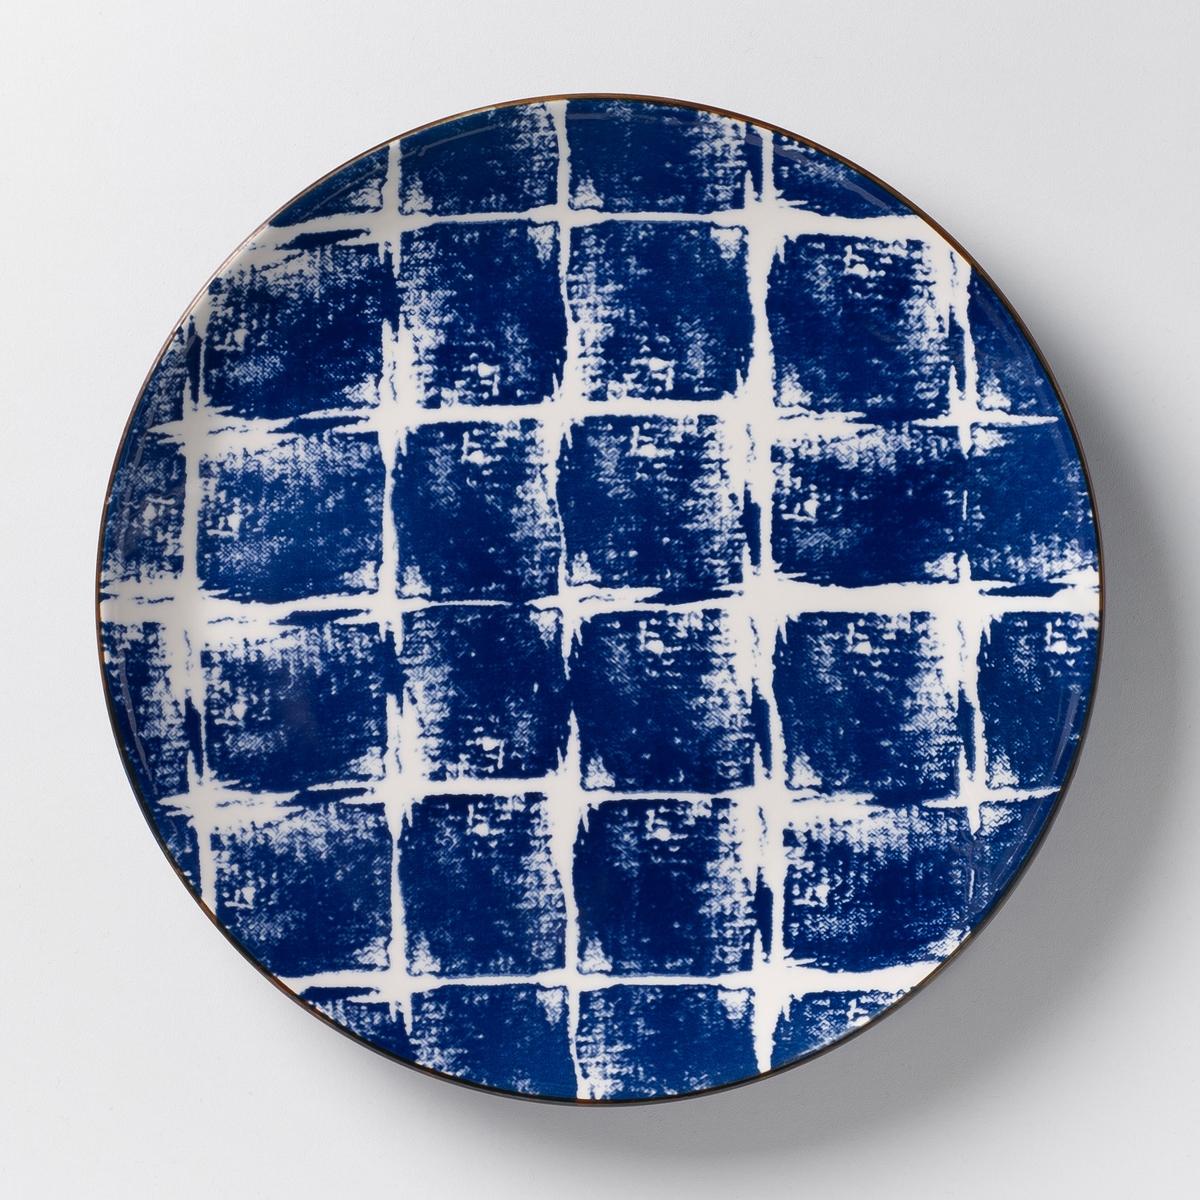 Комплект из 4 мелких тарелок из керамики Malado комплект из 4 мелких тарелок из фарфора ø25 см agaxan